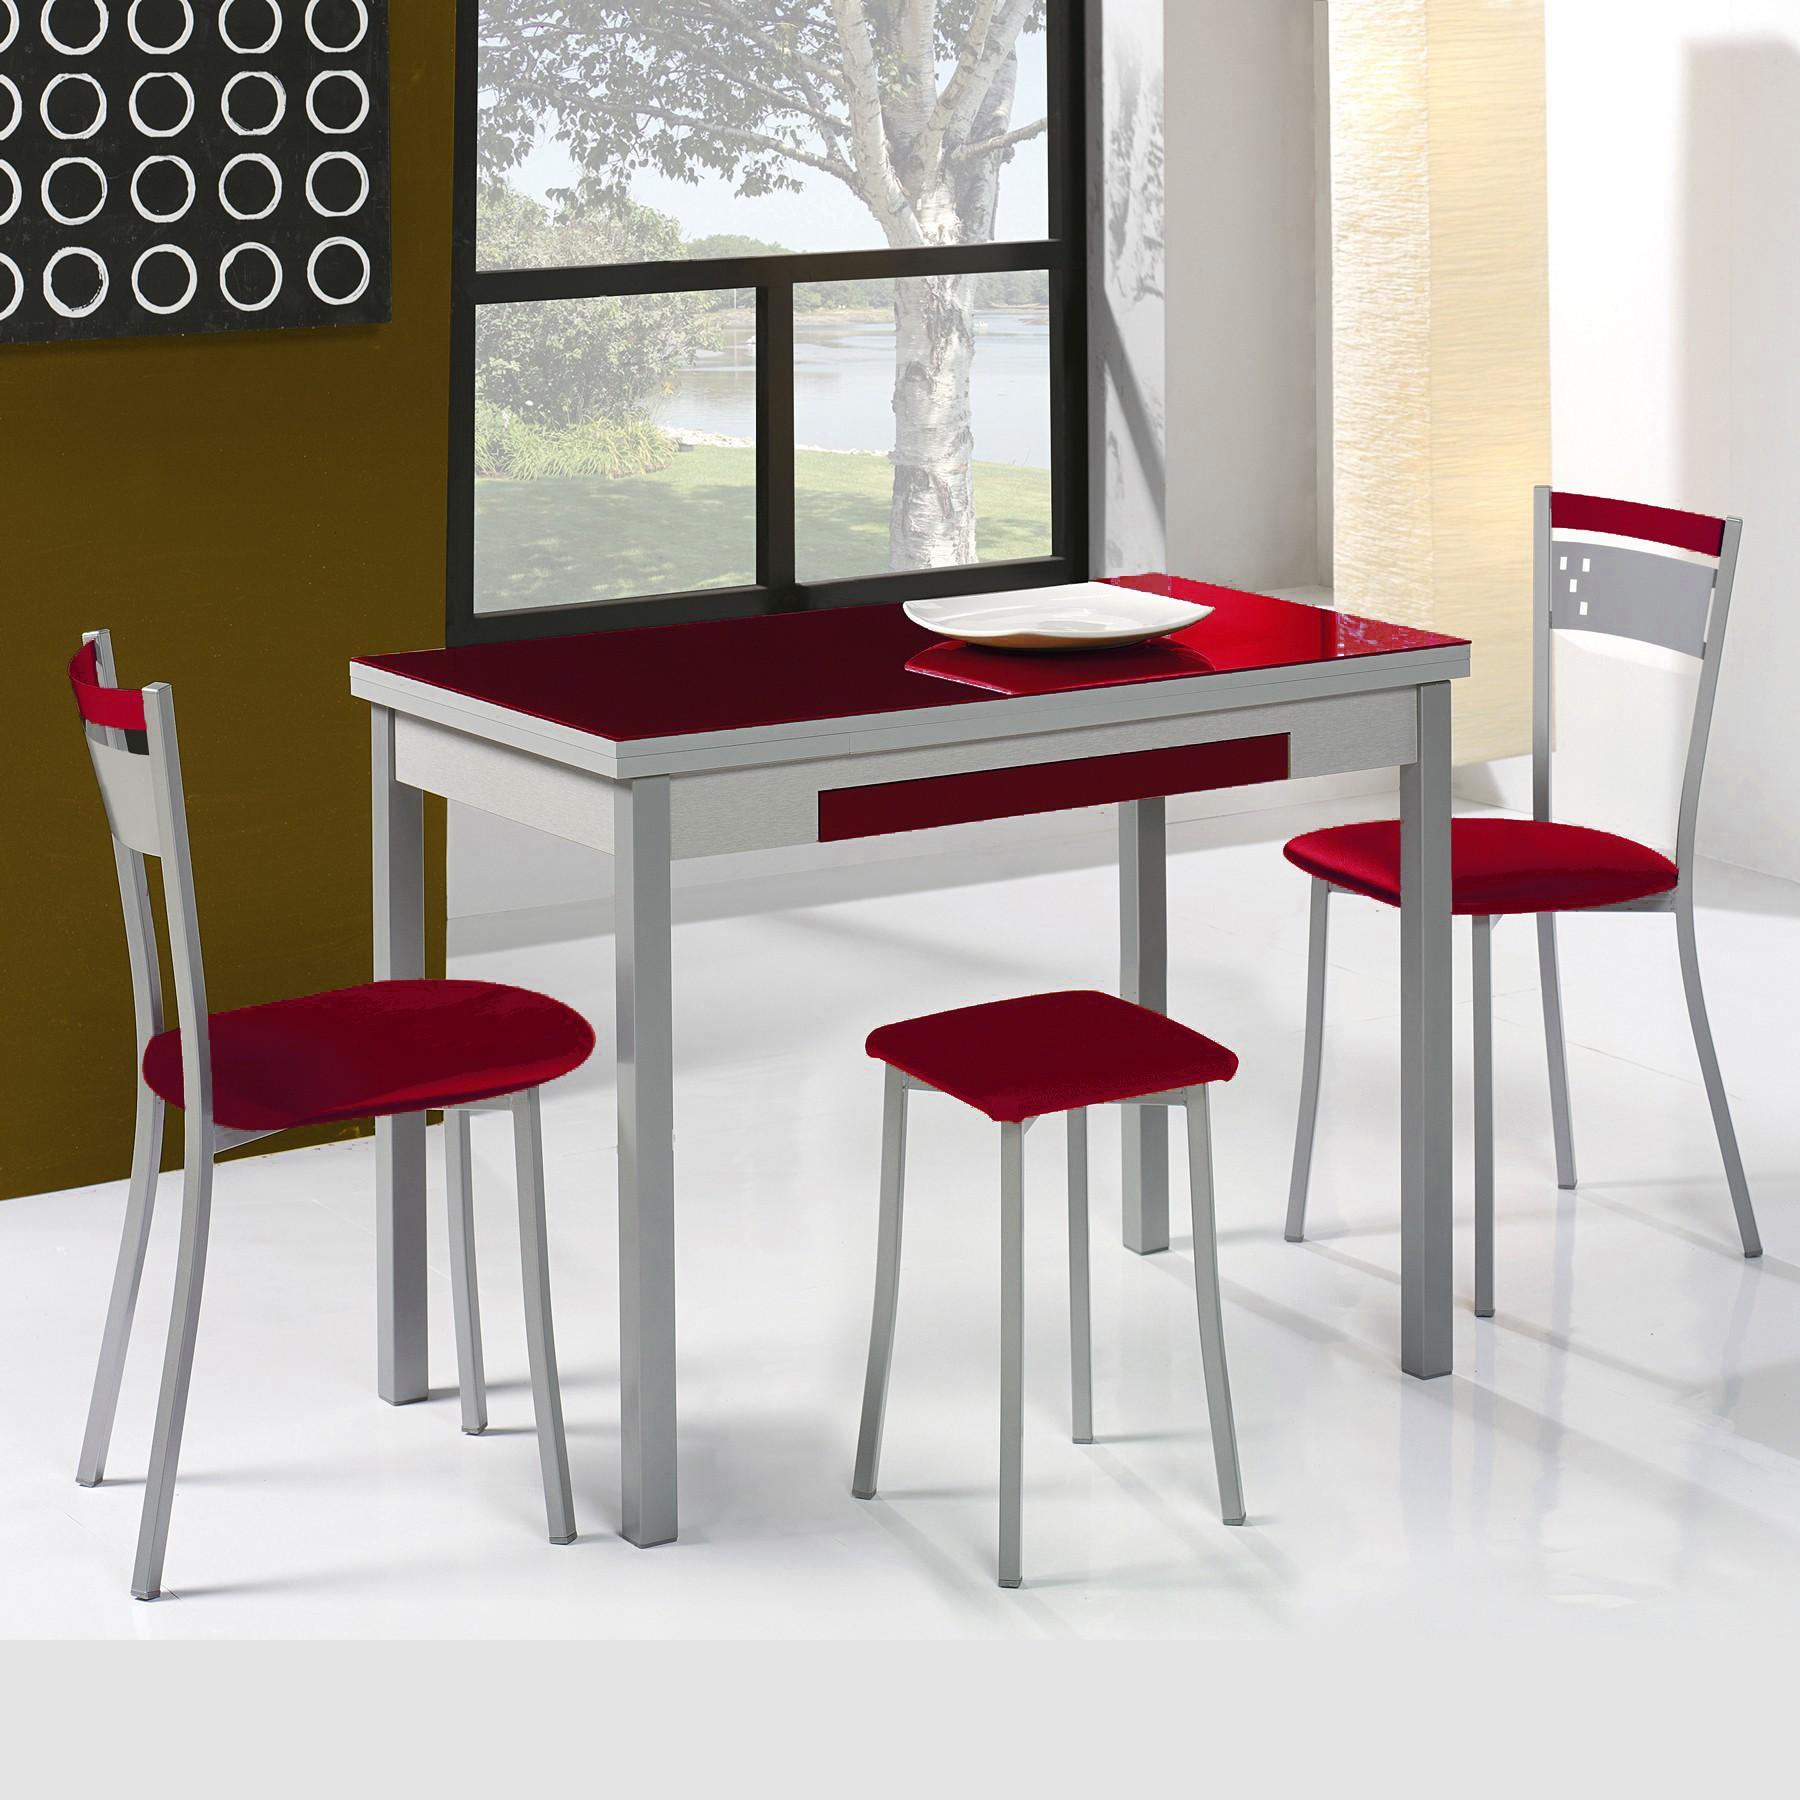 Pack mesa de cocina extensible y 4 sillas mod a - Mesas extensibles de cocina ...